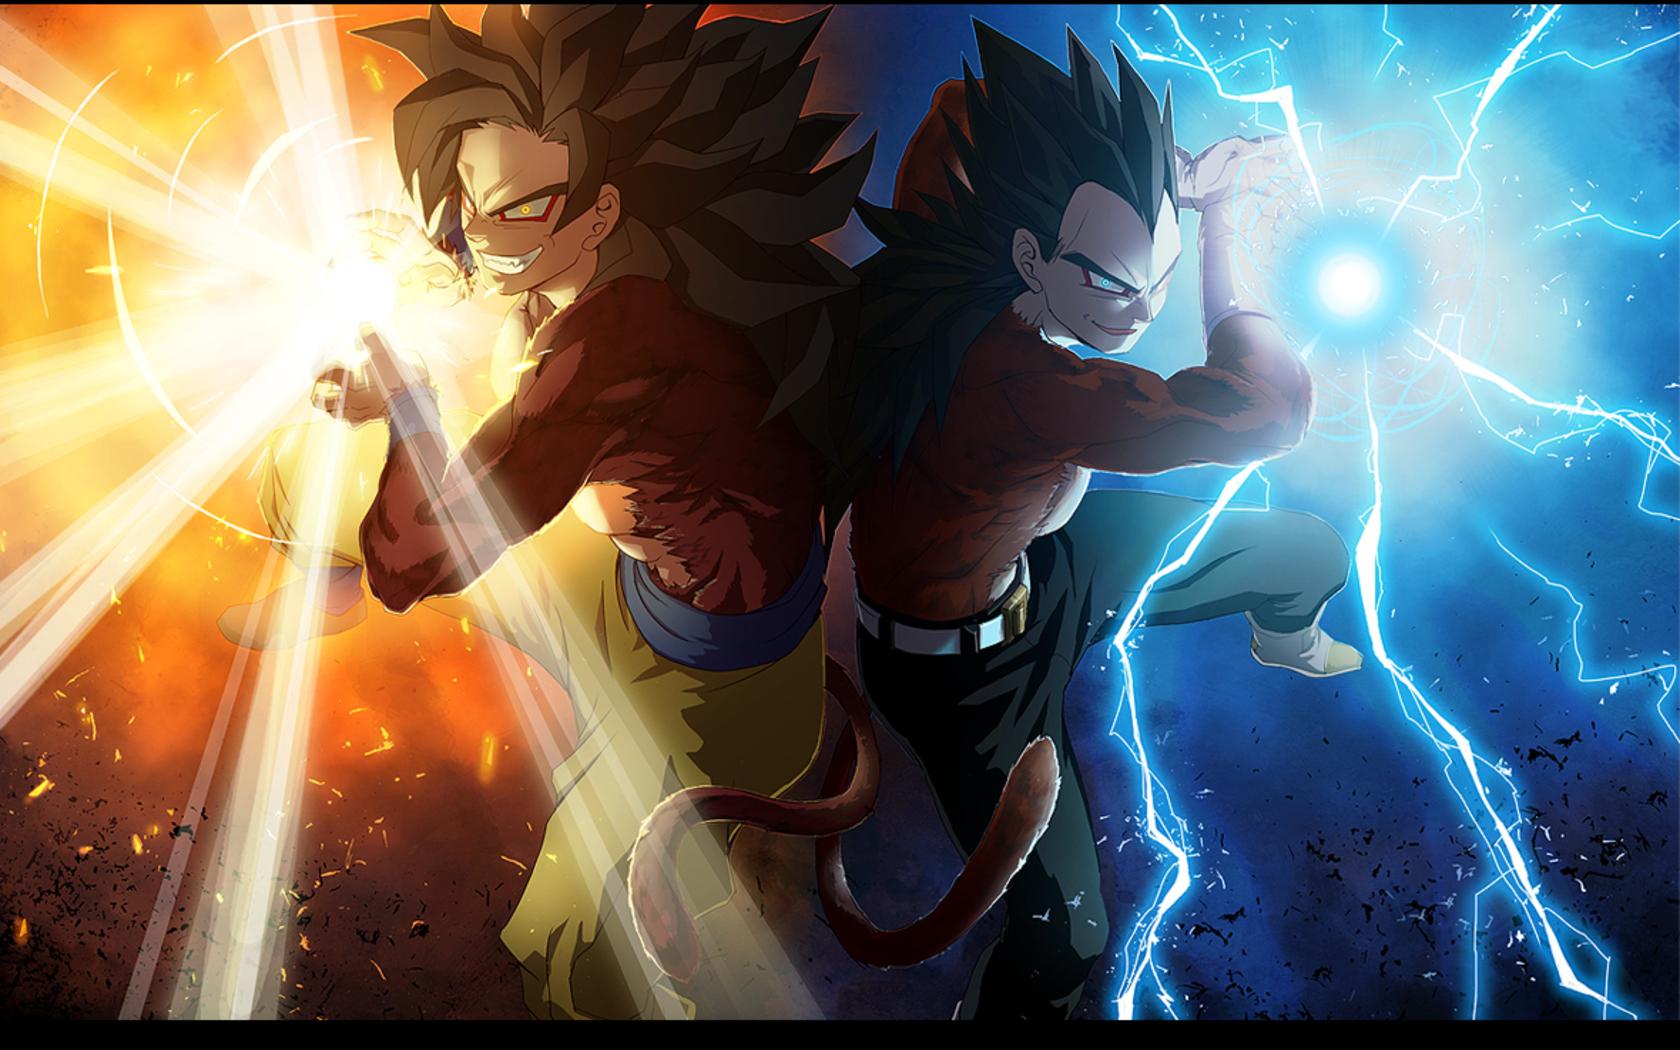 Goku Vegeta Hd Wallpaper Full HD Wallpapers 1680x1050